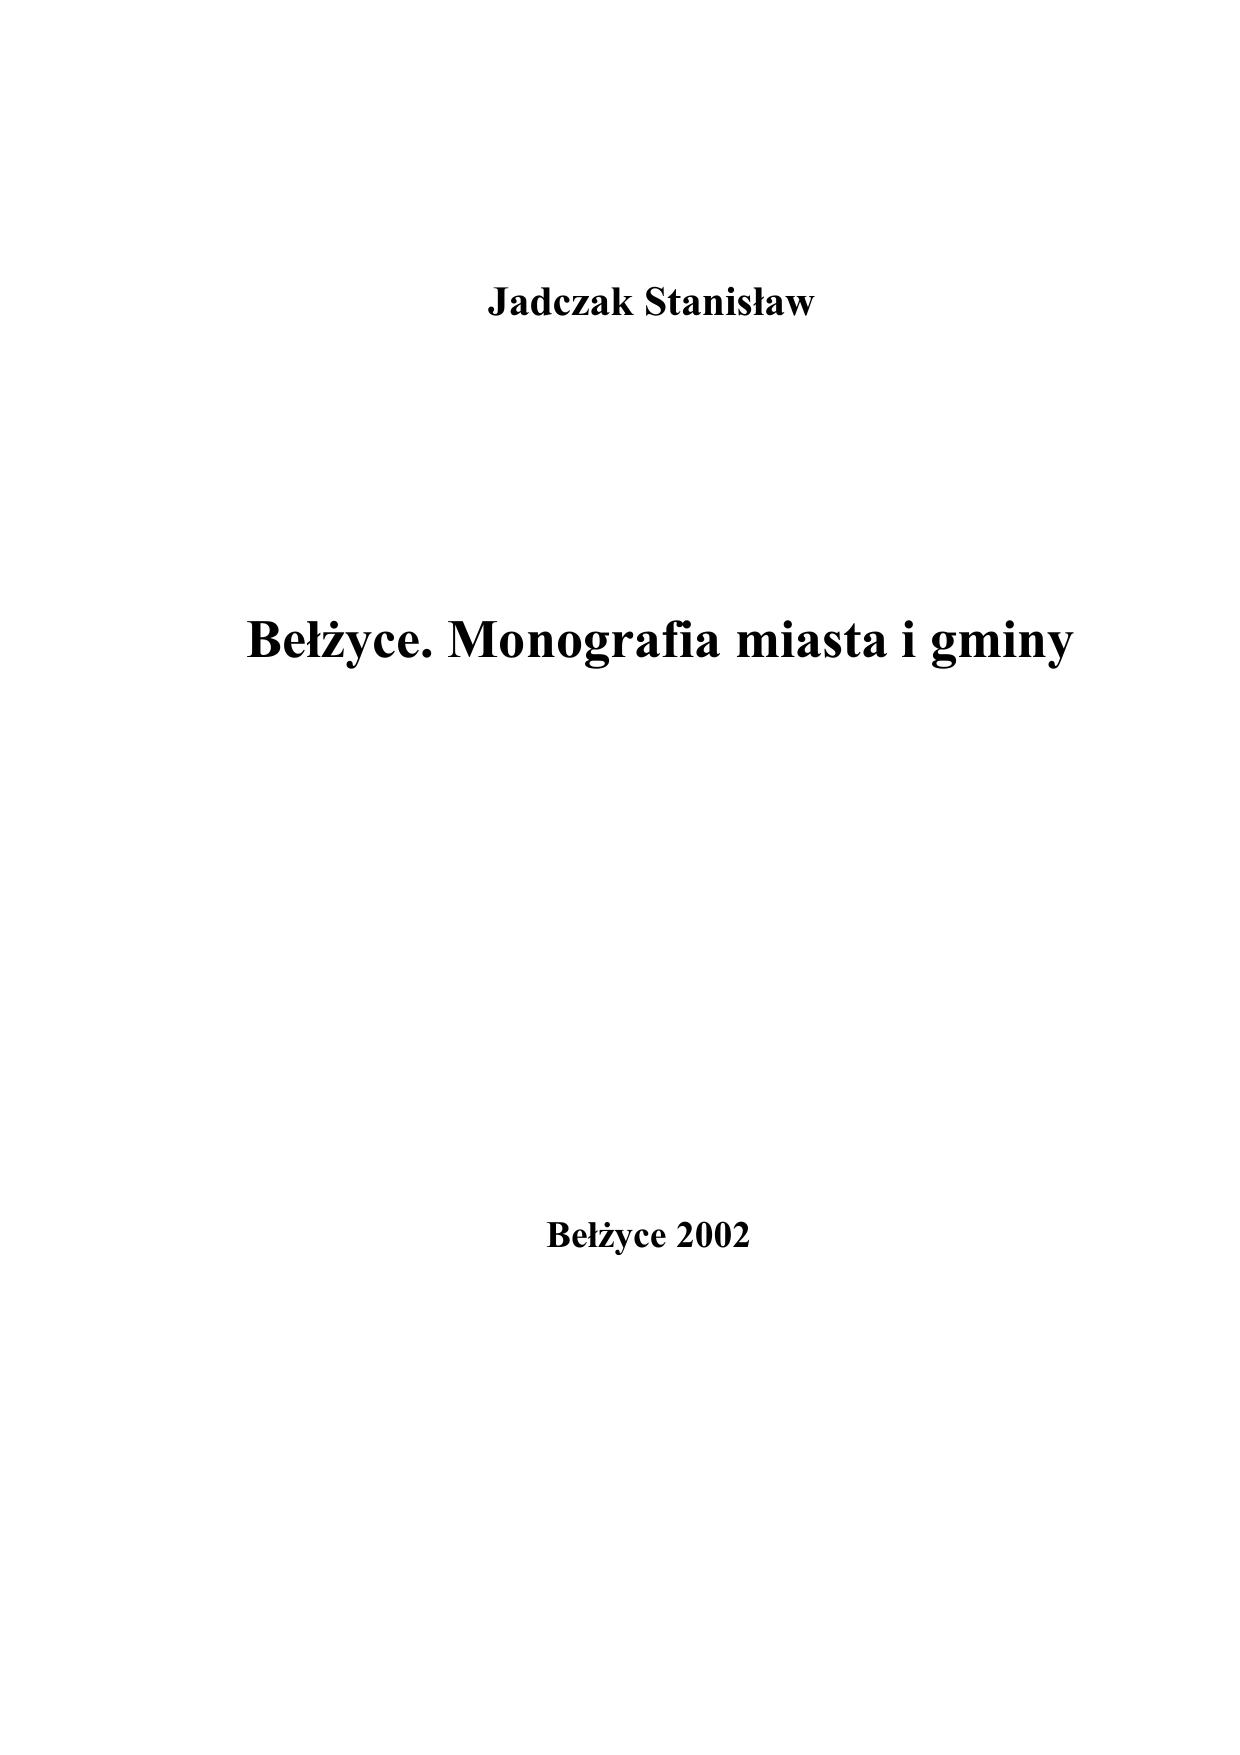 7a9a374ac8887 Bełżyce. Monografia miasta i gminy